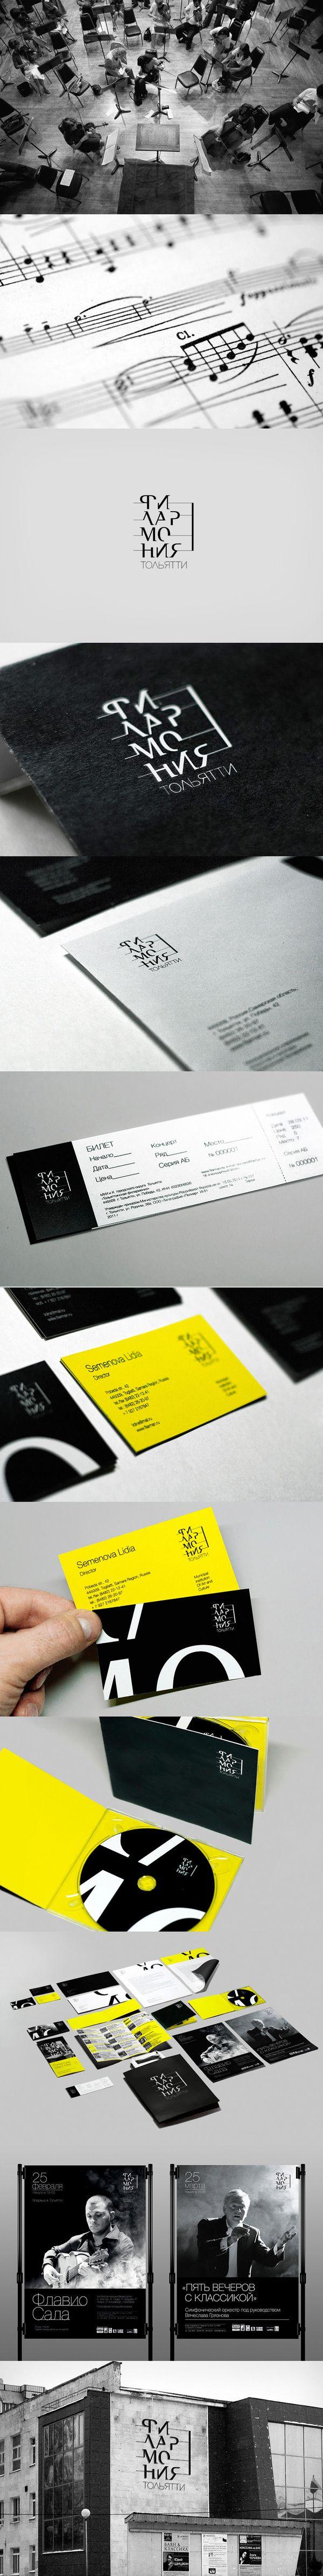 Togliatty Philarmony by Igor Hrupin brand book portfolio collection colour design